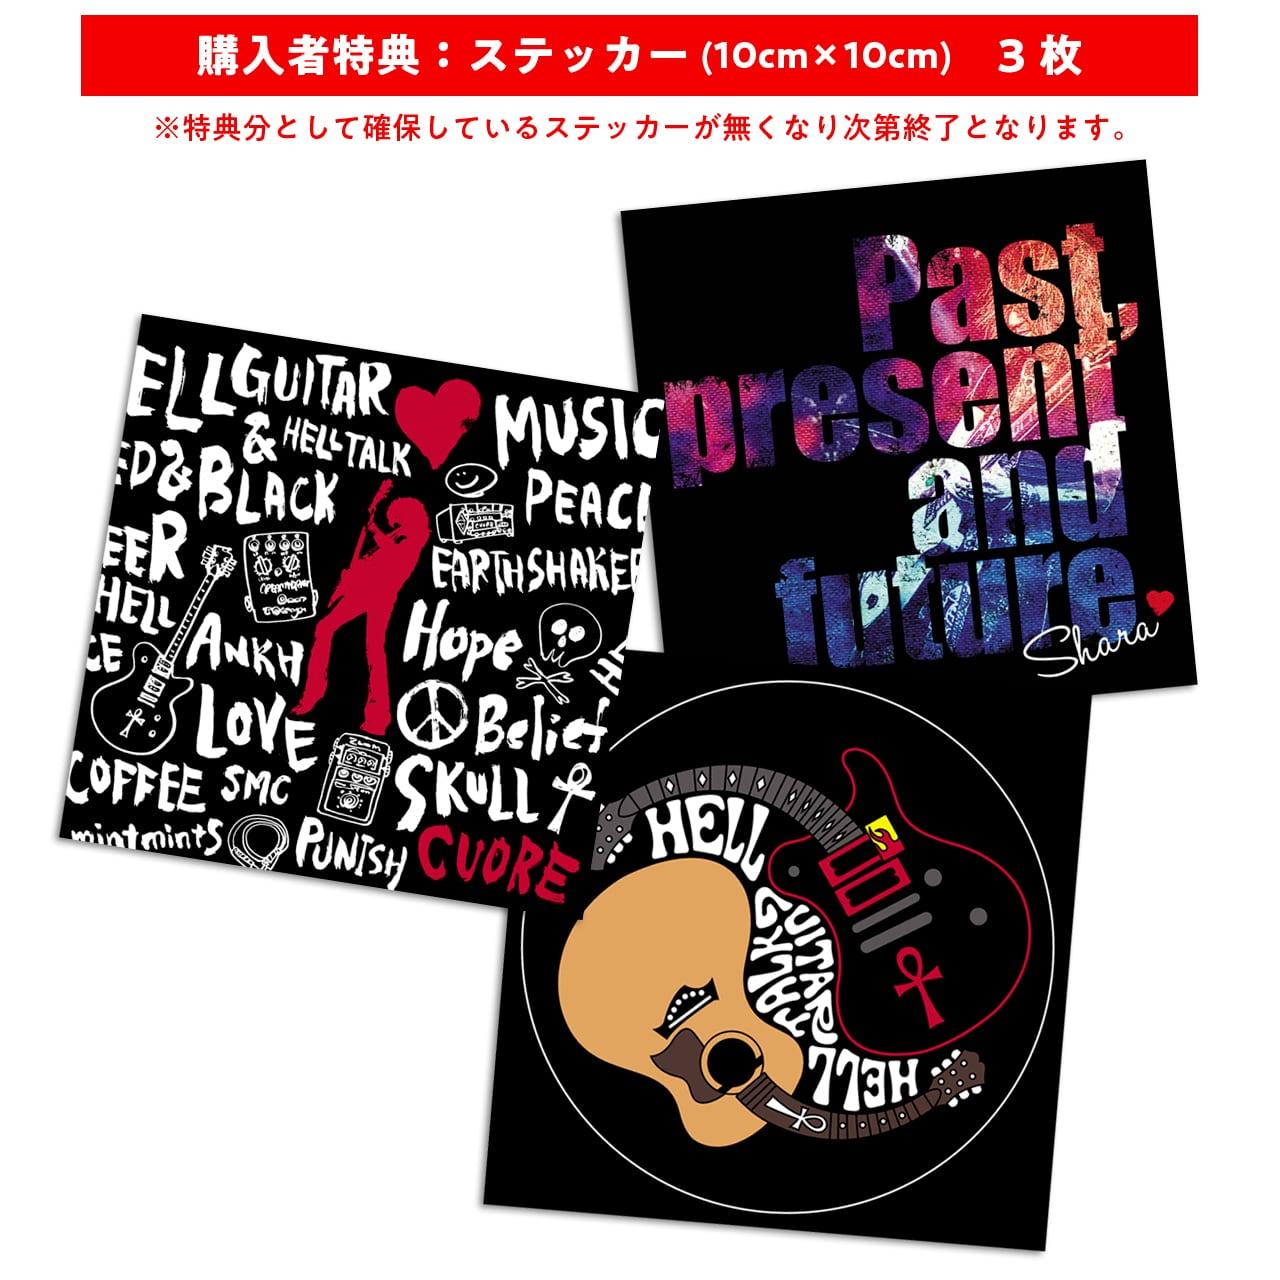 CD+DVD:『HELLTRAIN』mintmints(ミントミンツ) +特典付 - 画像2